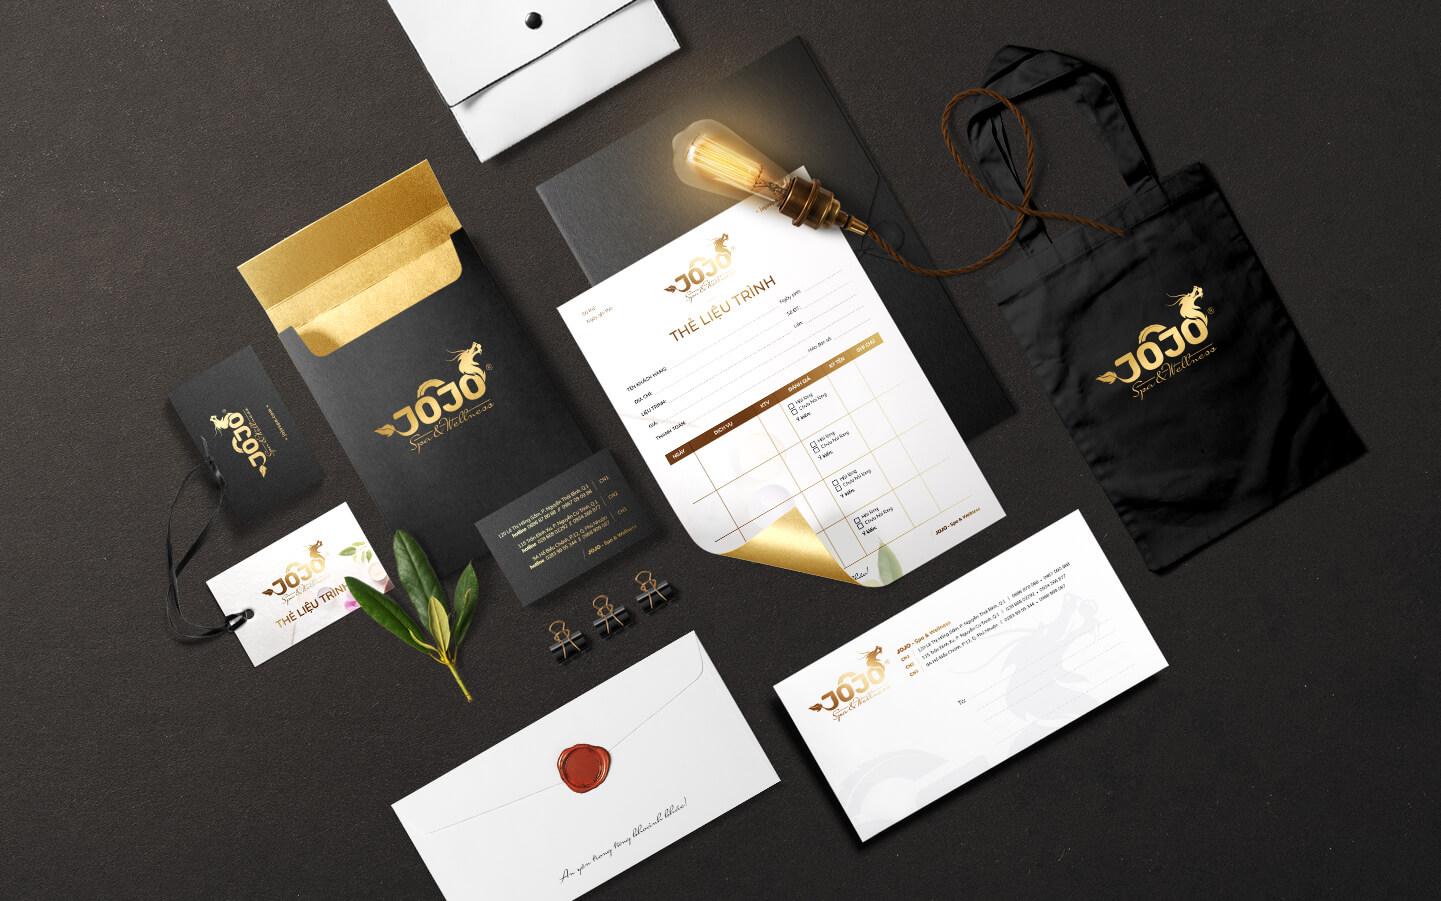 thiet-ke-logo-chuyen-nghiep-Jojo-spa-&-wellness-1